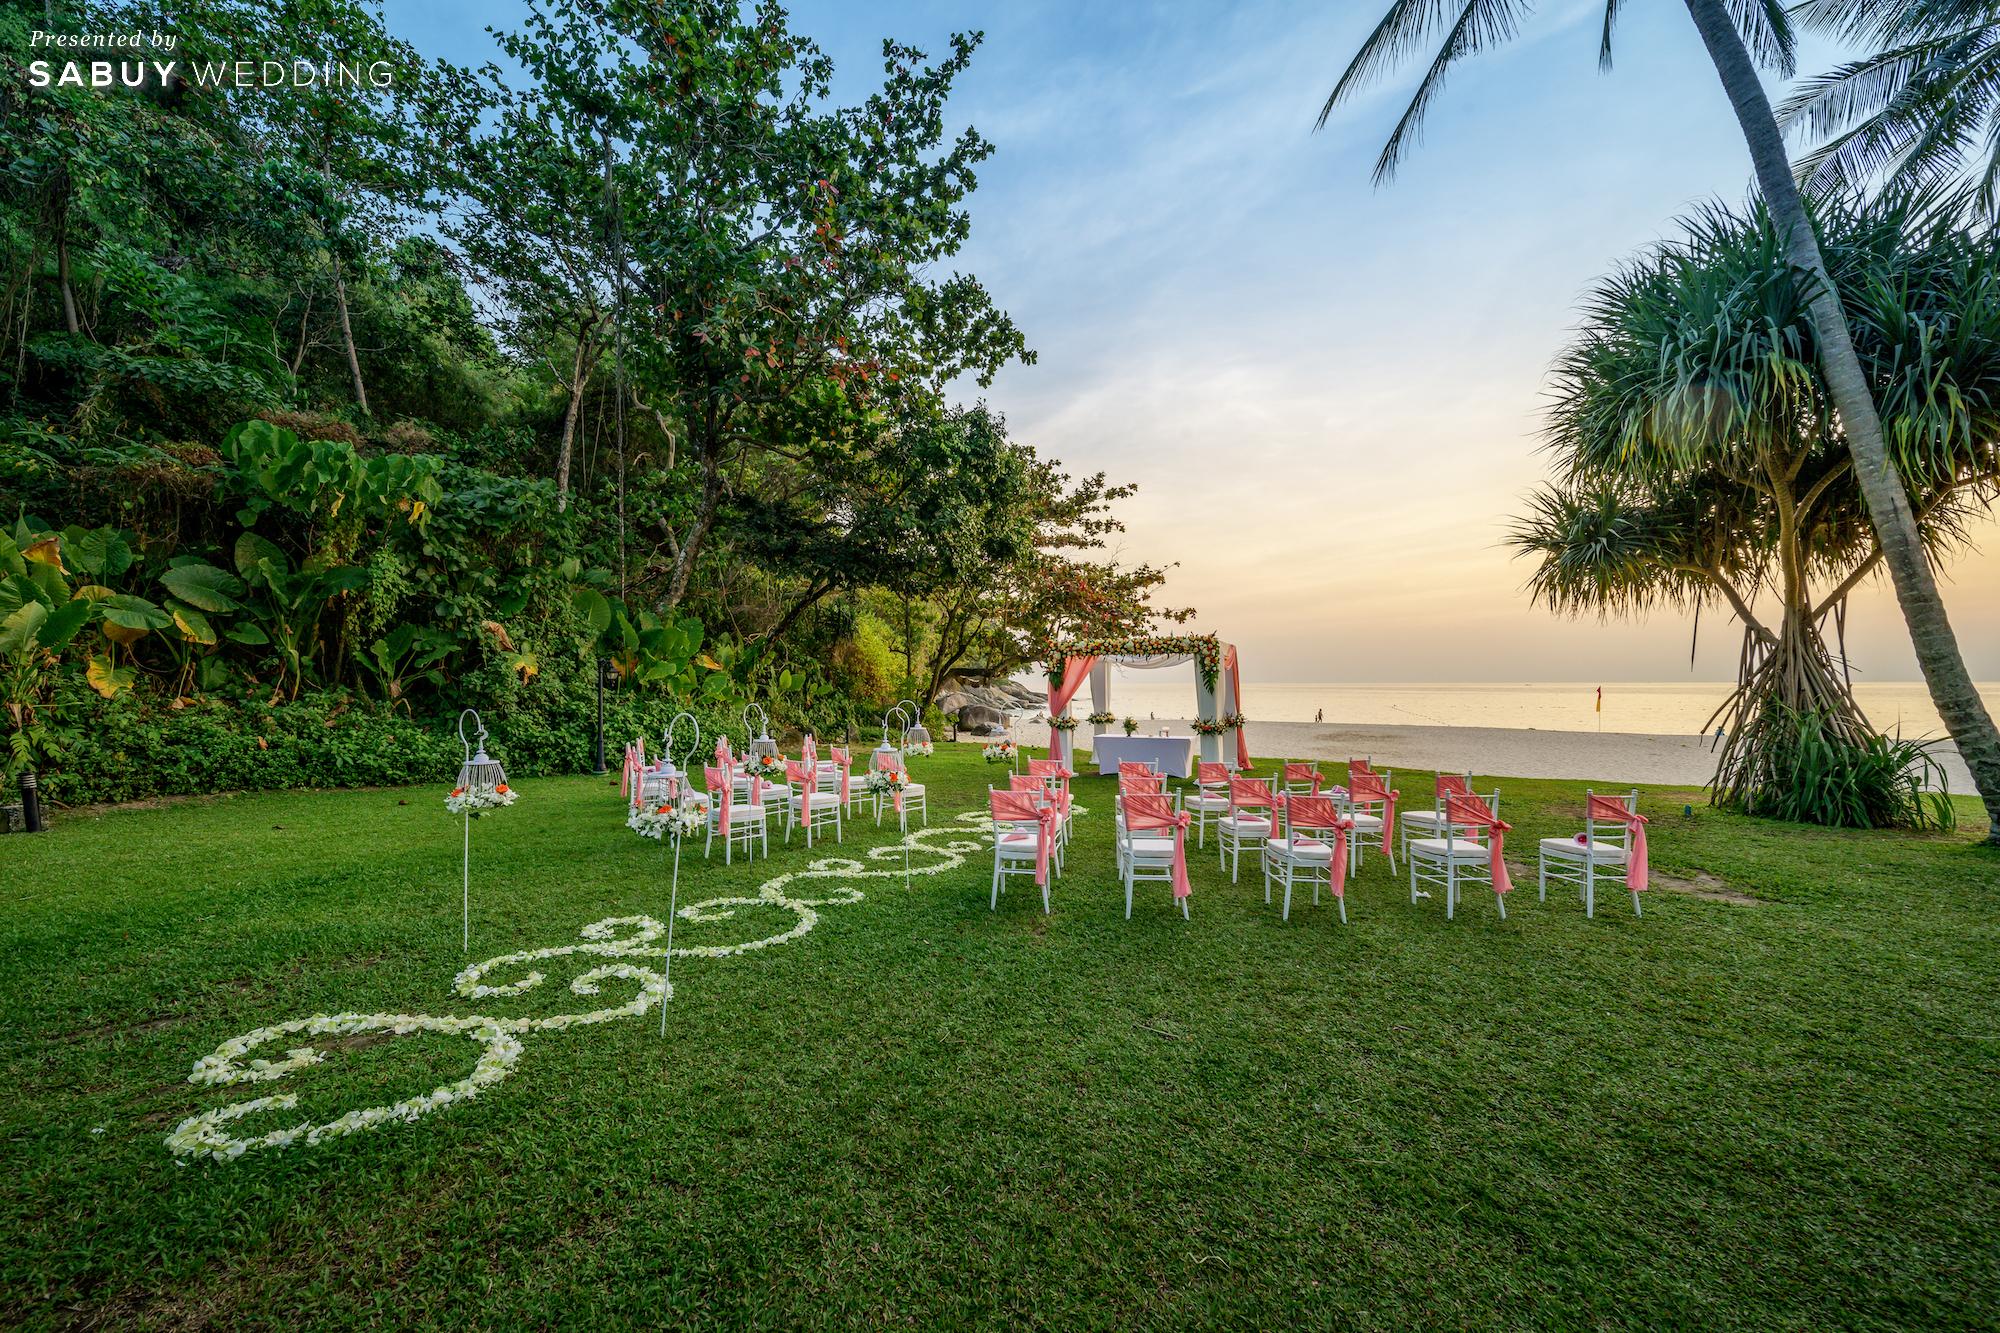 LE MÉRIDIEN PHUKET BEACH RESORT,Marriott Wedding Thailand,แมริออท ประเทศไทย,สถานที่แต่งงาน,สถานที่จัดงานแต่งงาน,โรงแรม,งานแต่งงาน,งานแต่ง outdoor,งานแต่งริมทะเล,งานแต่งชายทะเล,งานแต่งในสวน ครบทุกความต้องการของบ่าวสาว กับ 40 สถานที่แต่งงานในเครือ Marriott